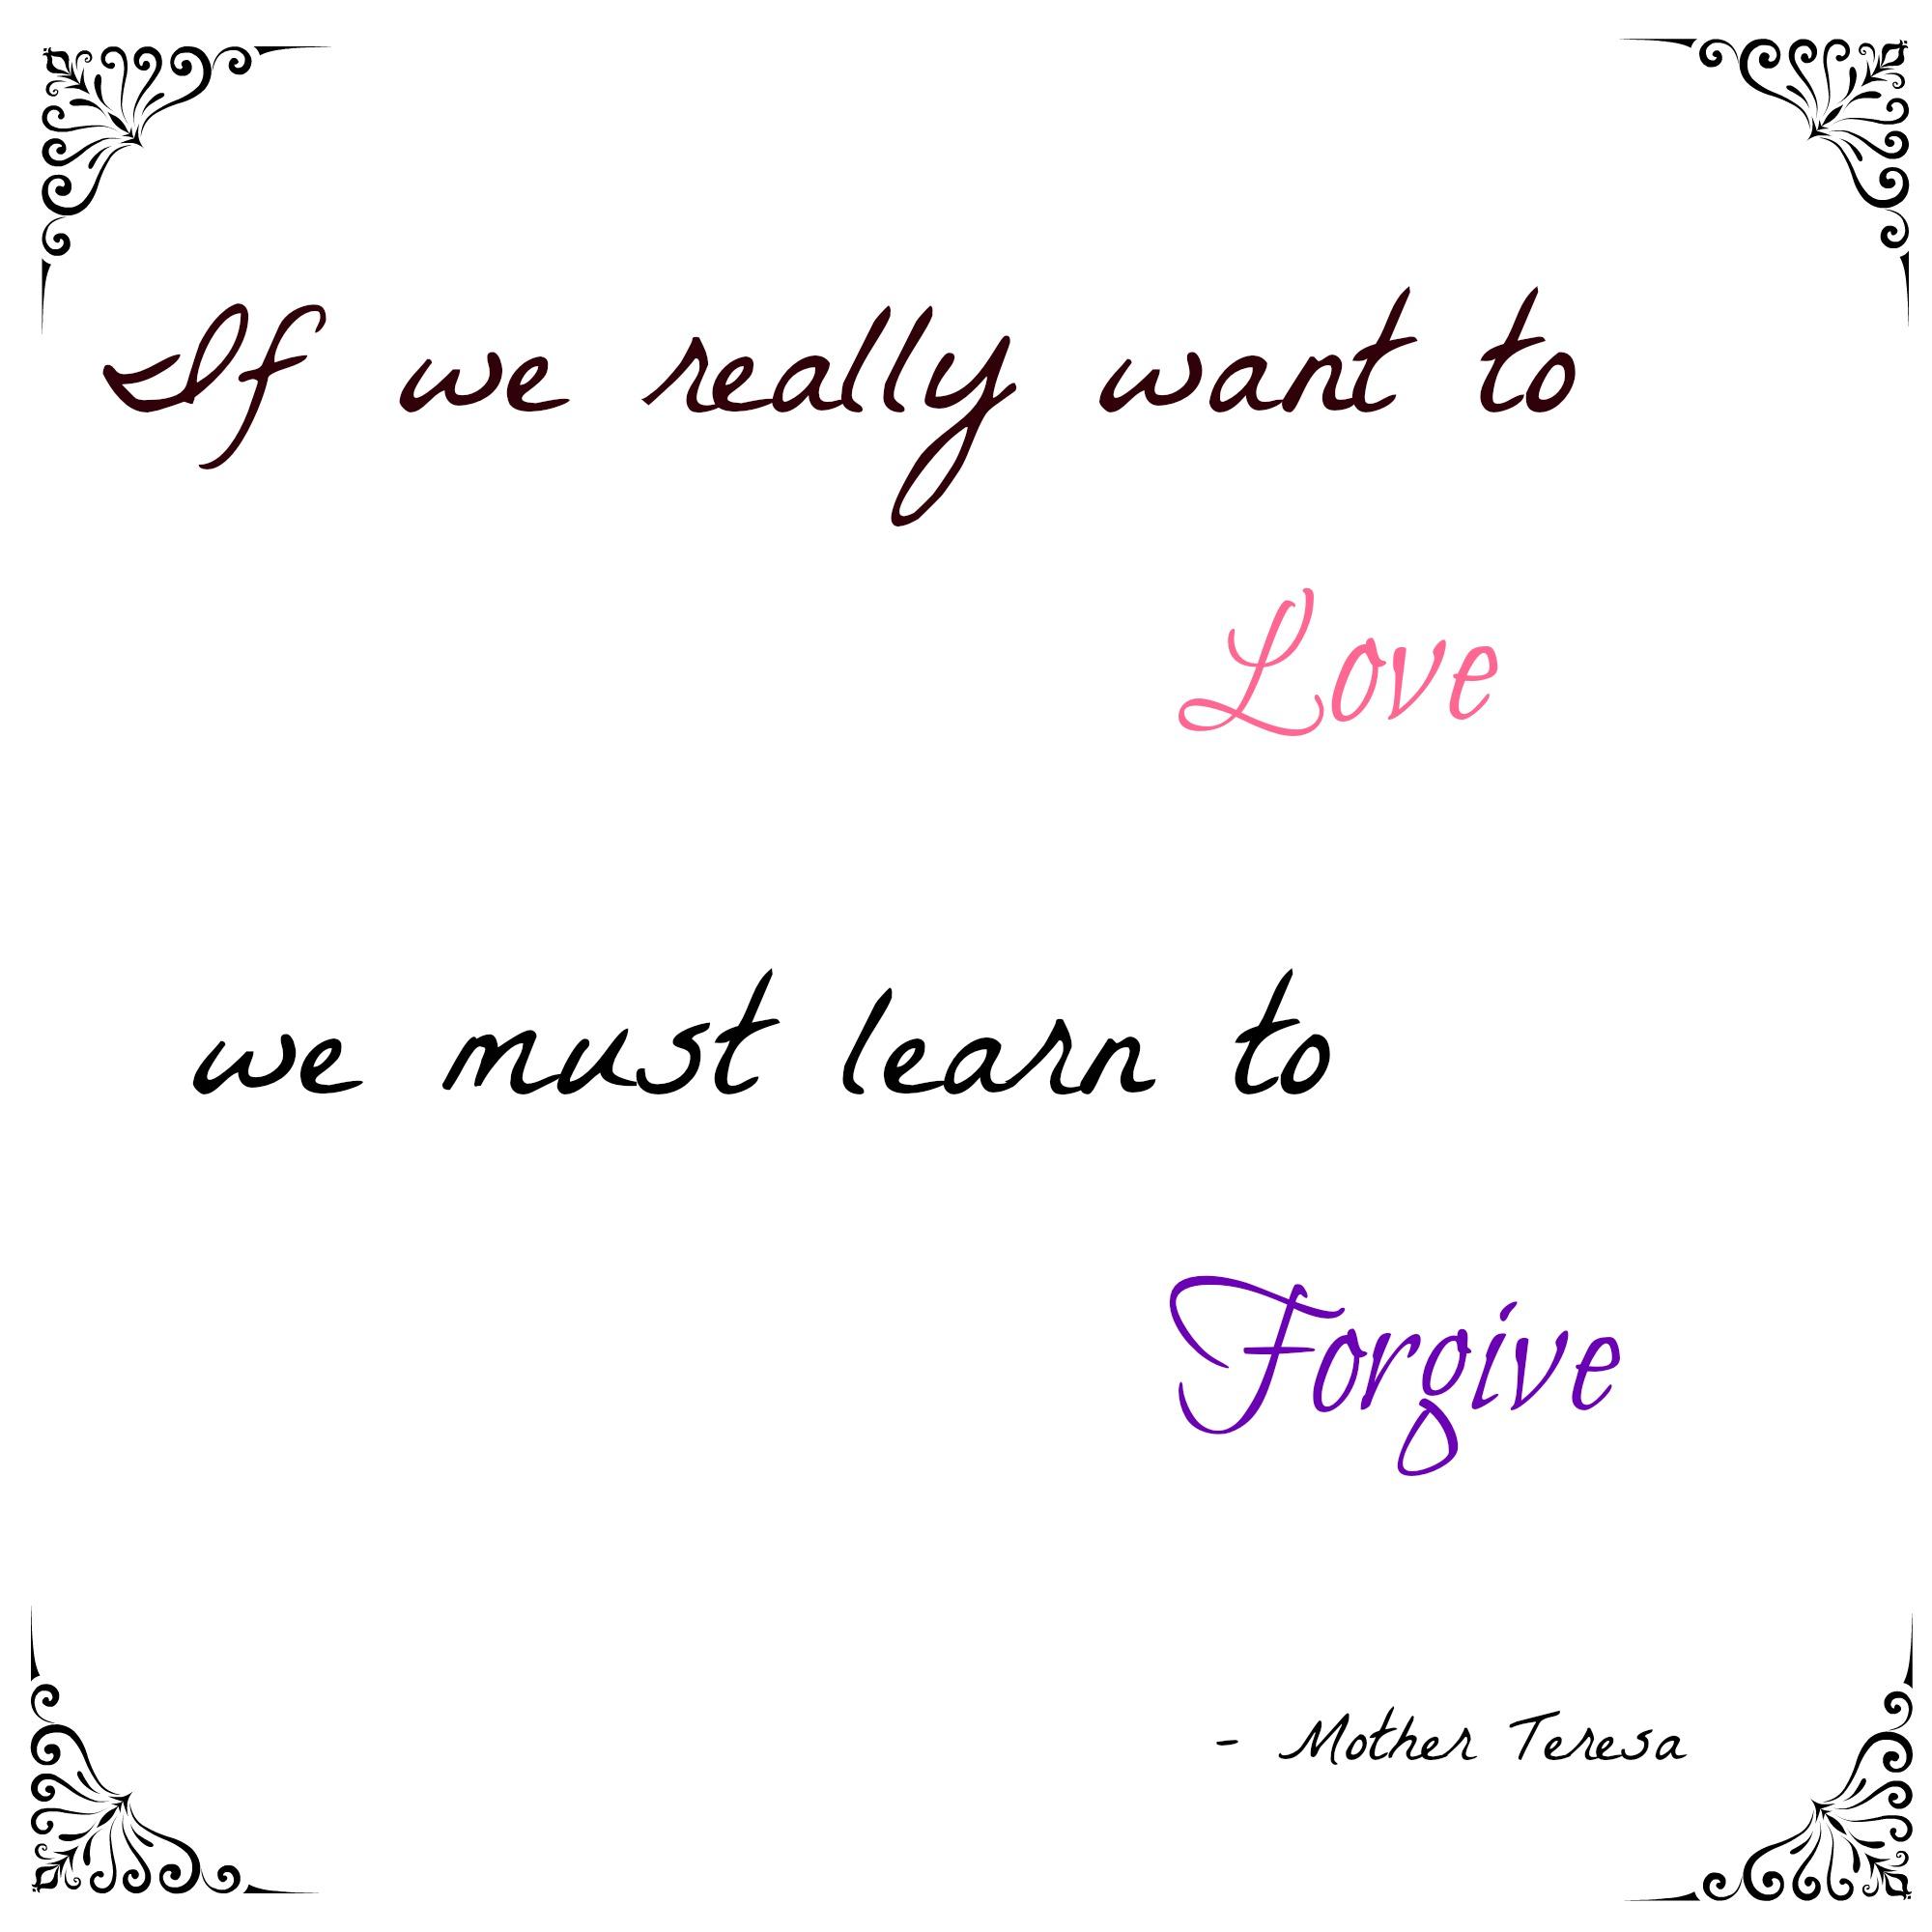 Forgiveness lent